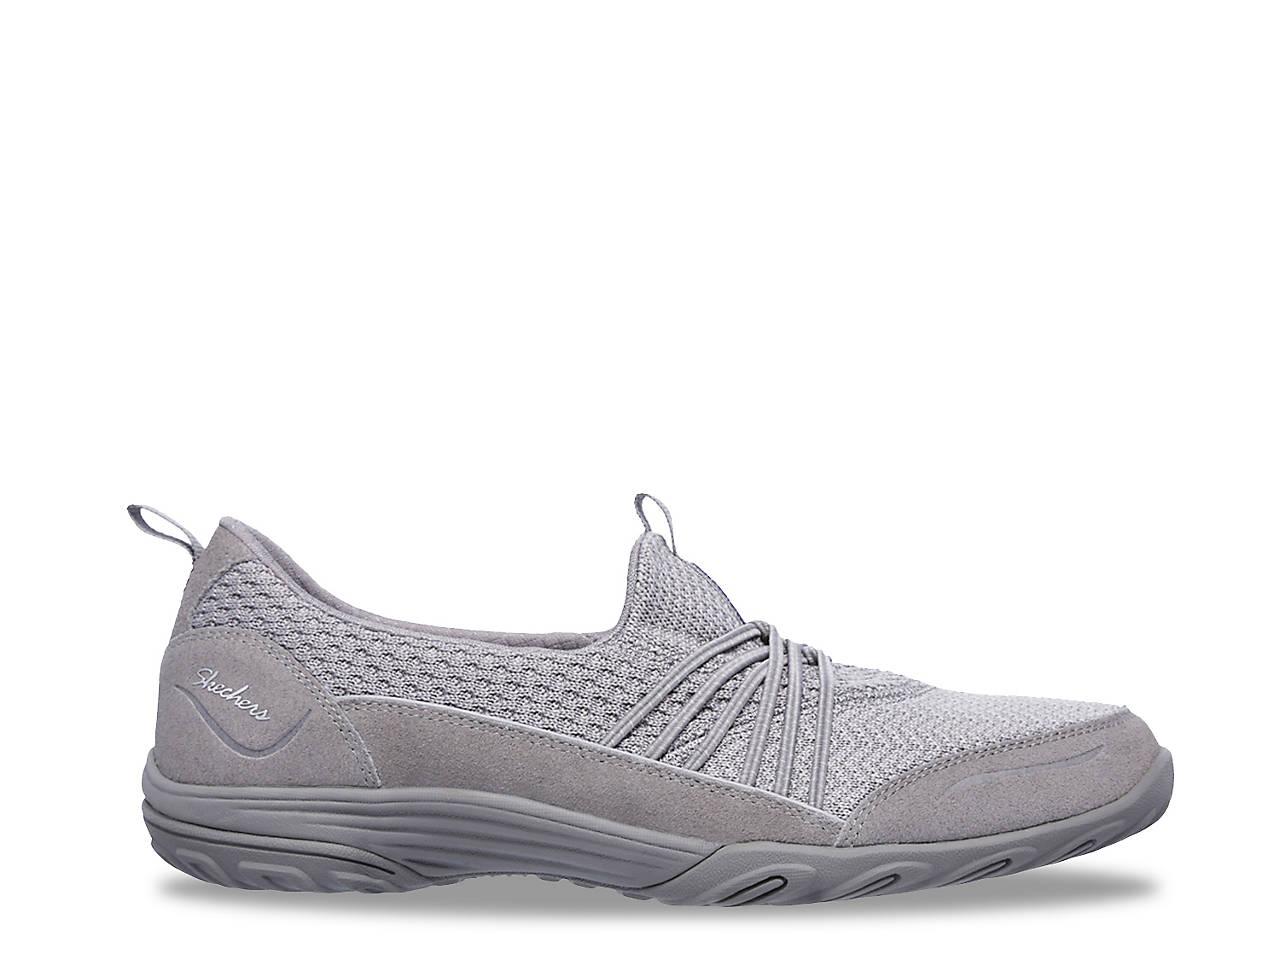 d64a78a830f3 Skechers Classic Fit Empress Slip-On Sneaker Women s Shoes